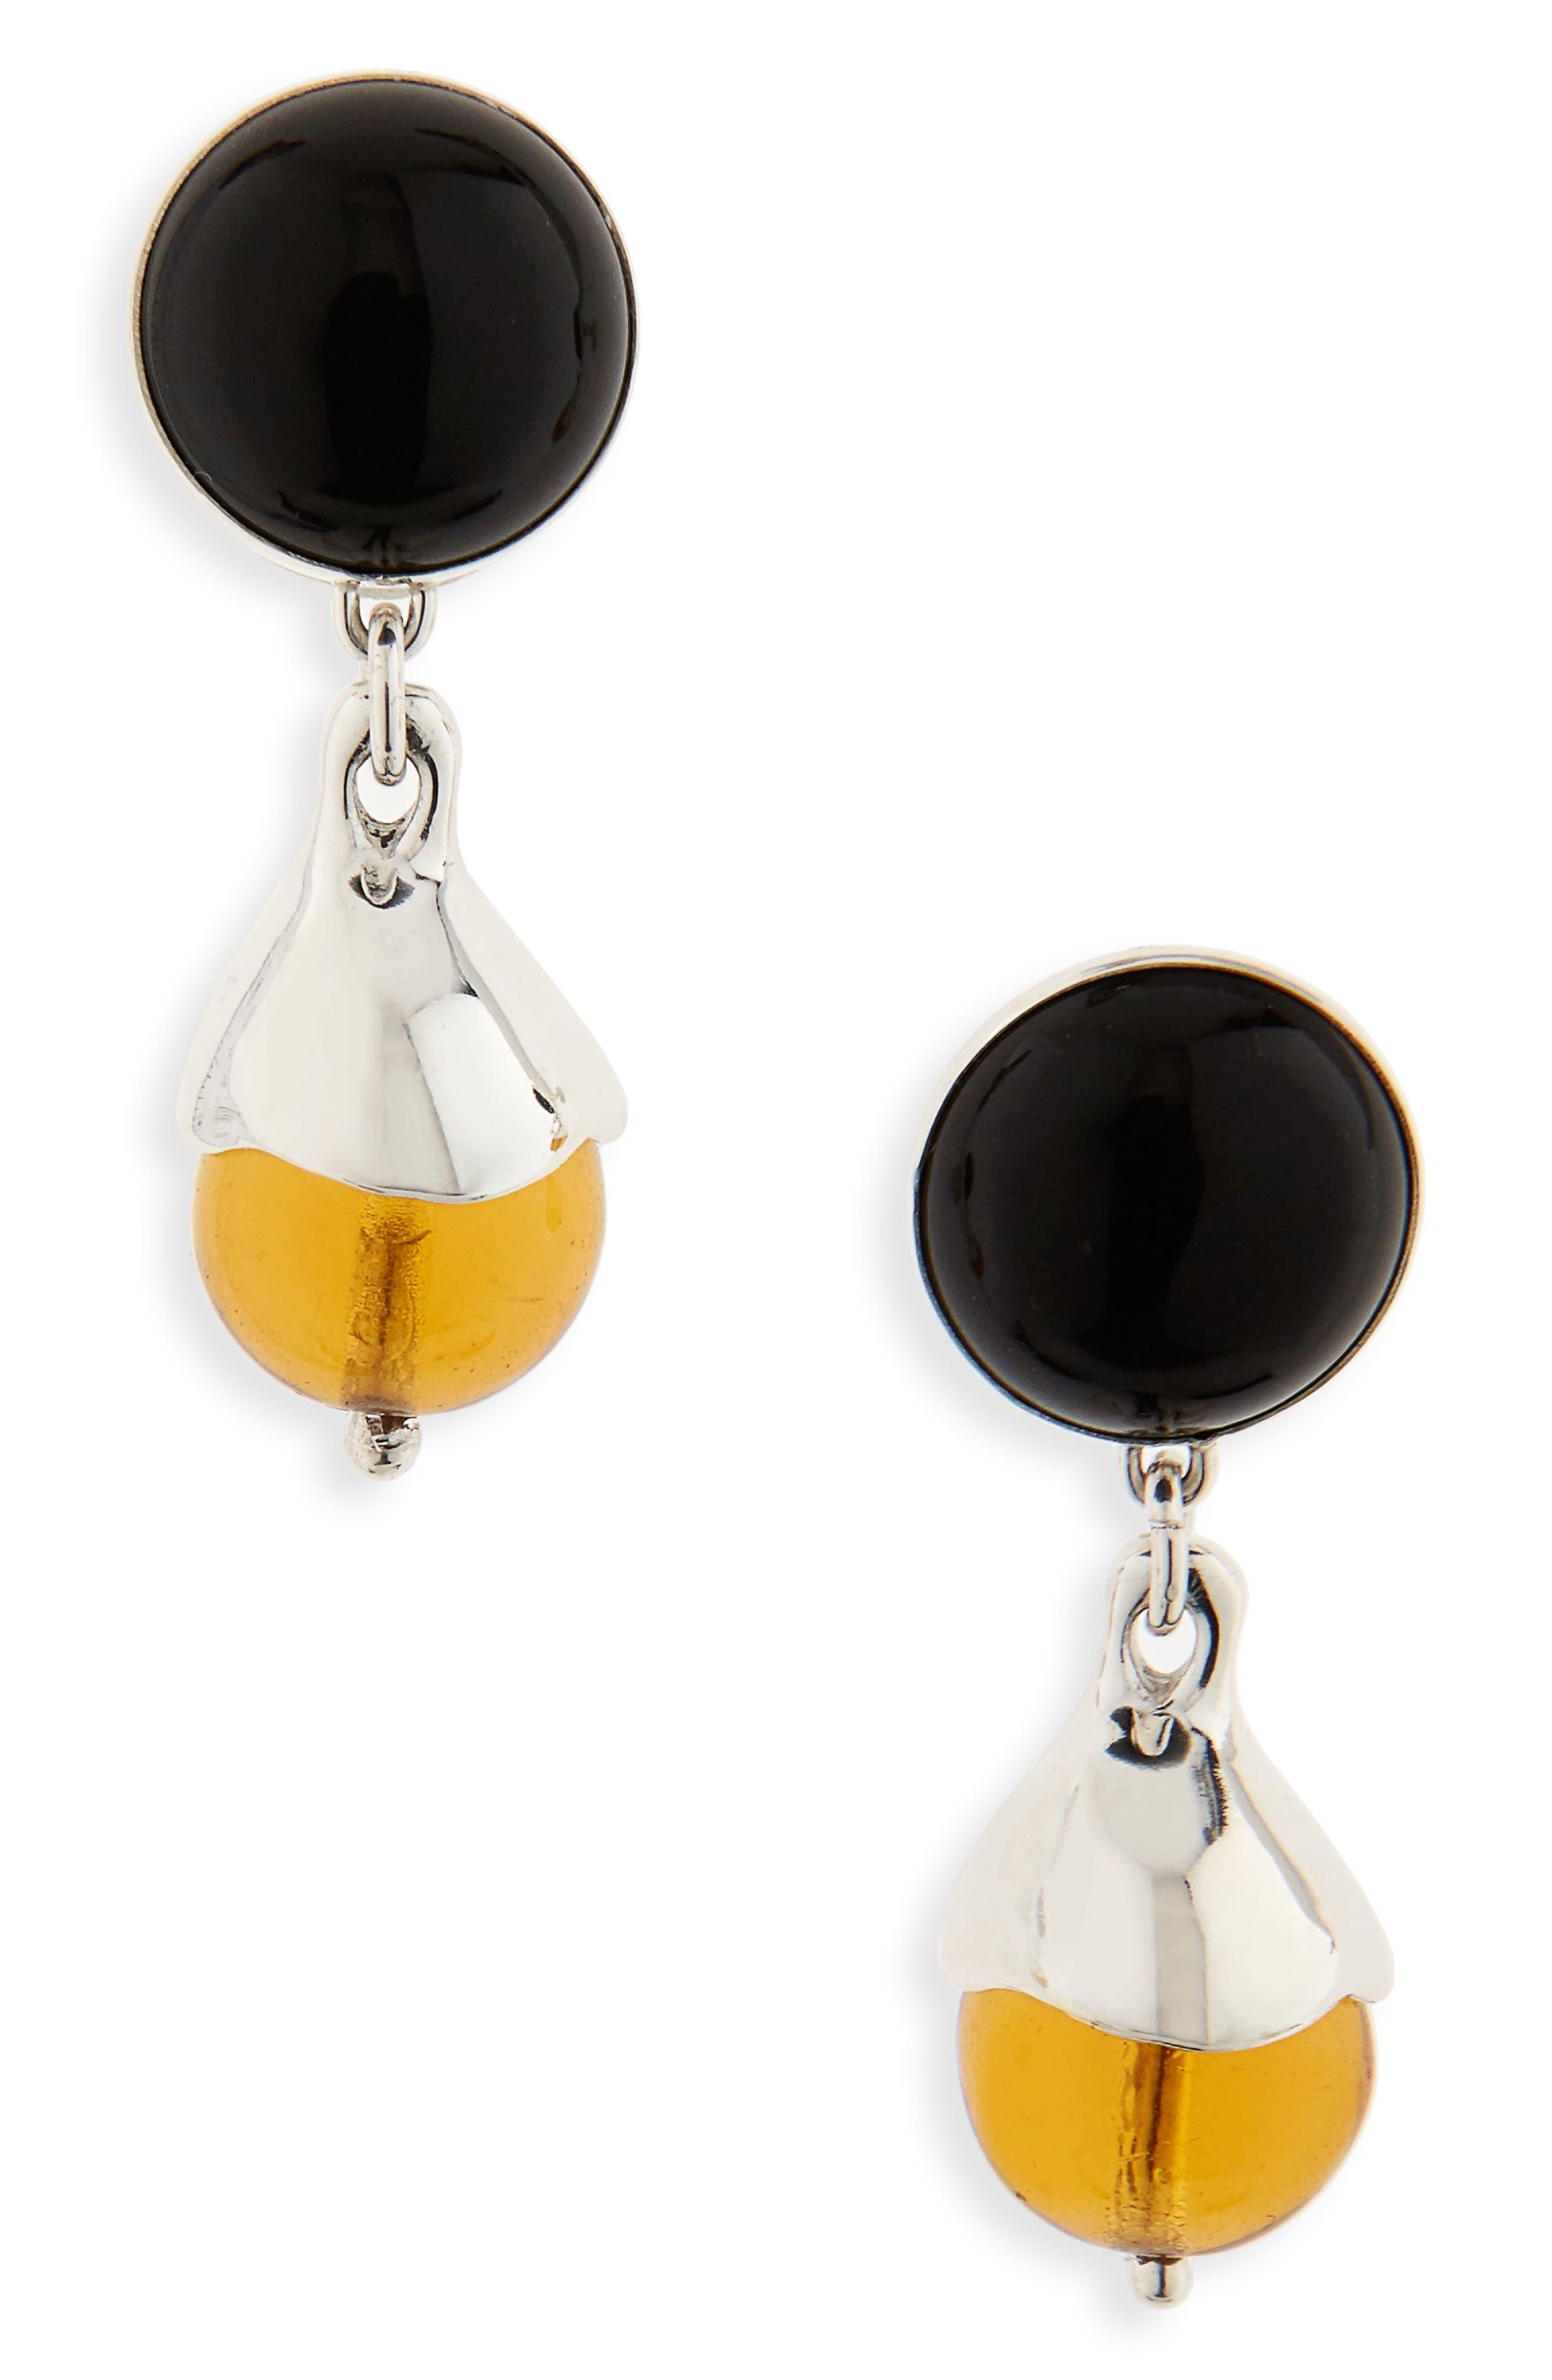 Chapeau Drop Earrings,                             Main thumbnail 1, color,                             STERLING SILVER